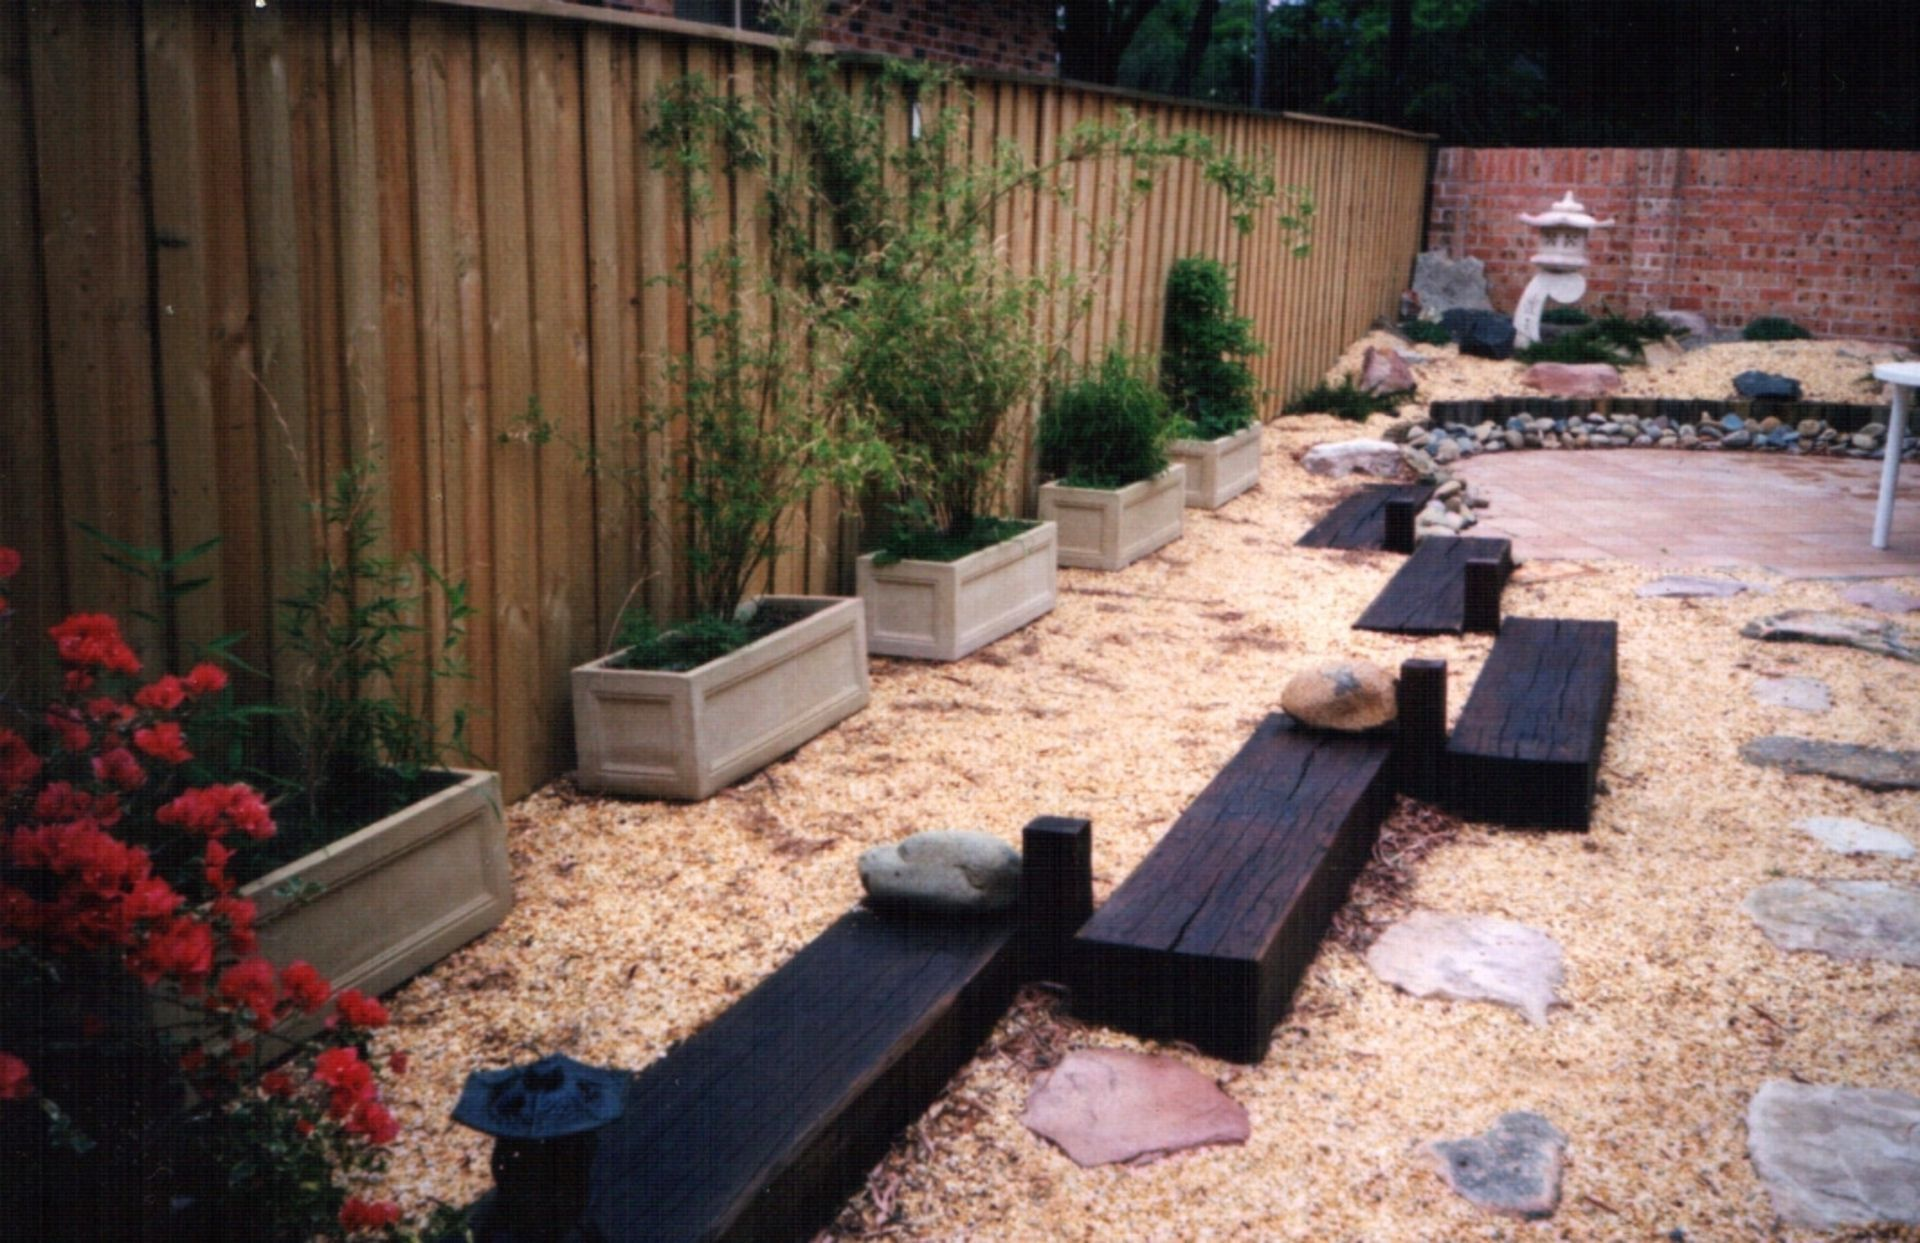 cheap backyard ideas no grass | Small front yard ... on Cheap No Grass Backyard Ideas id=66095